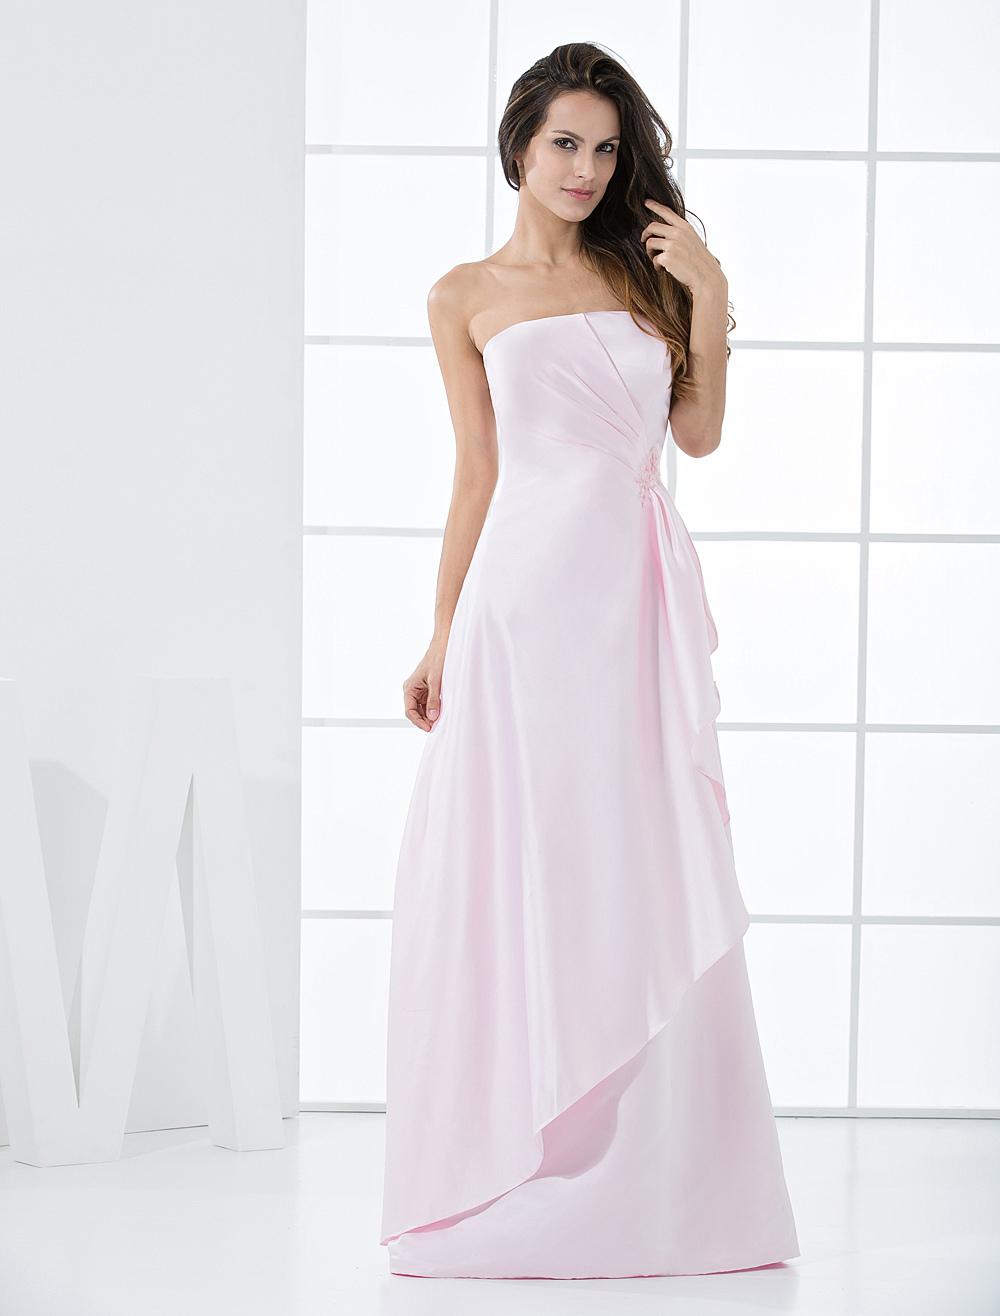 Pink Strapless Satin Floor Length Bridesmaid Dress